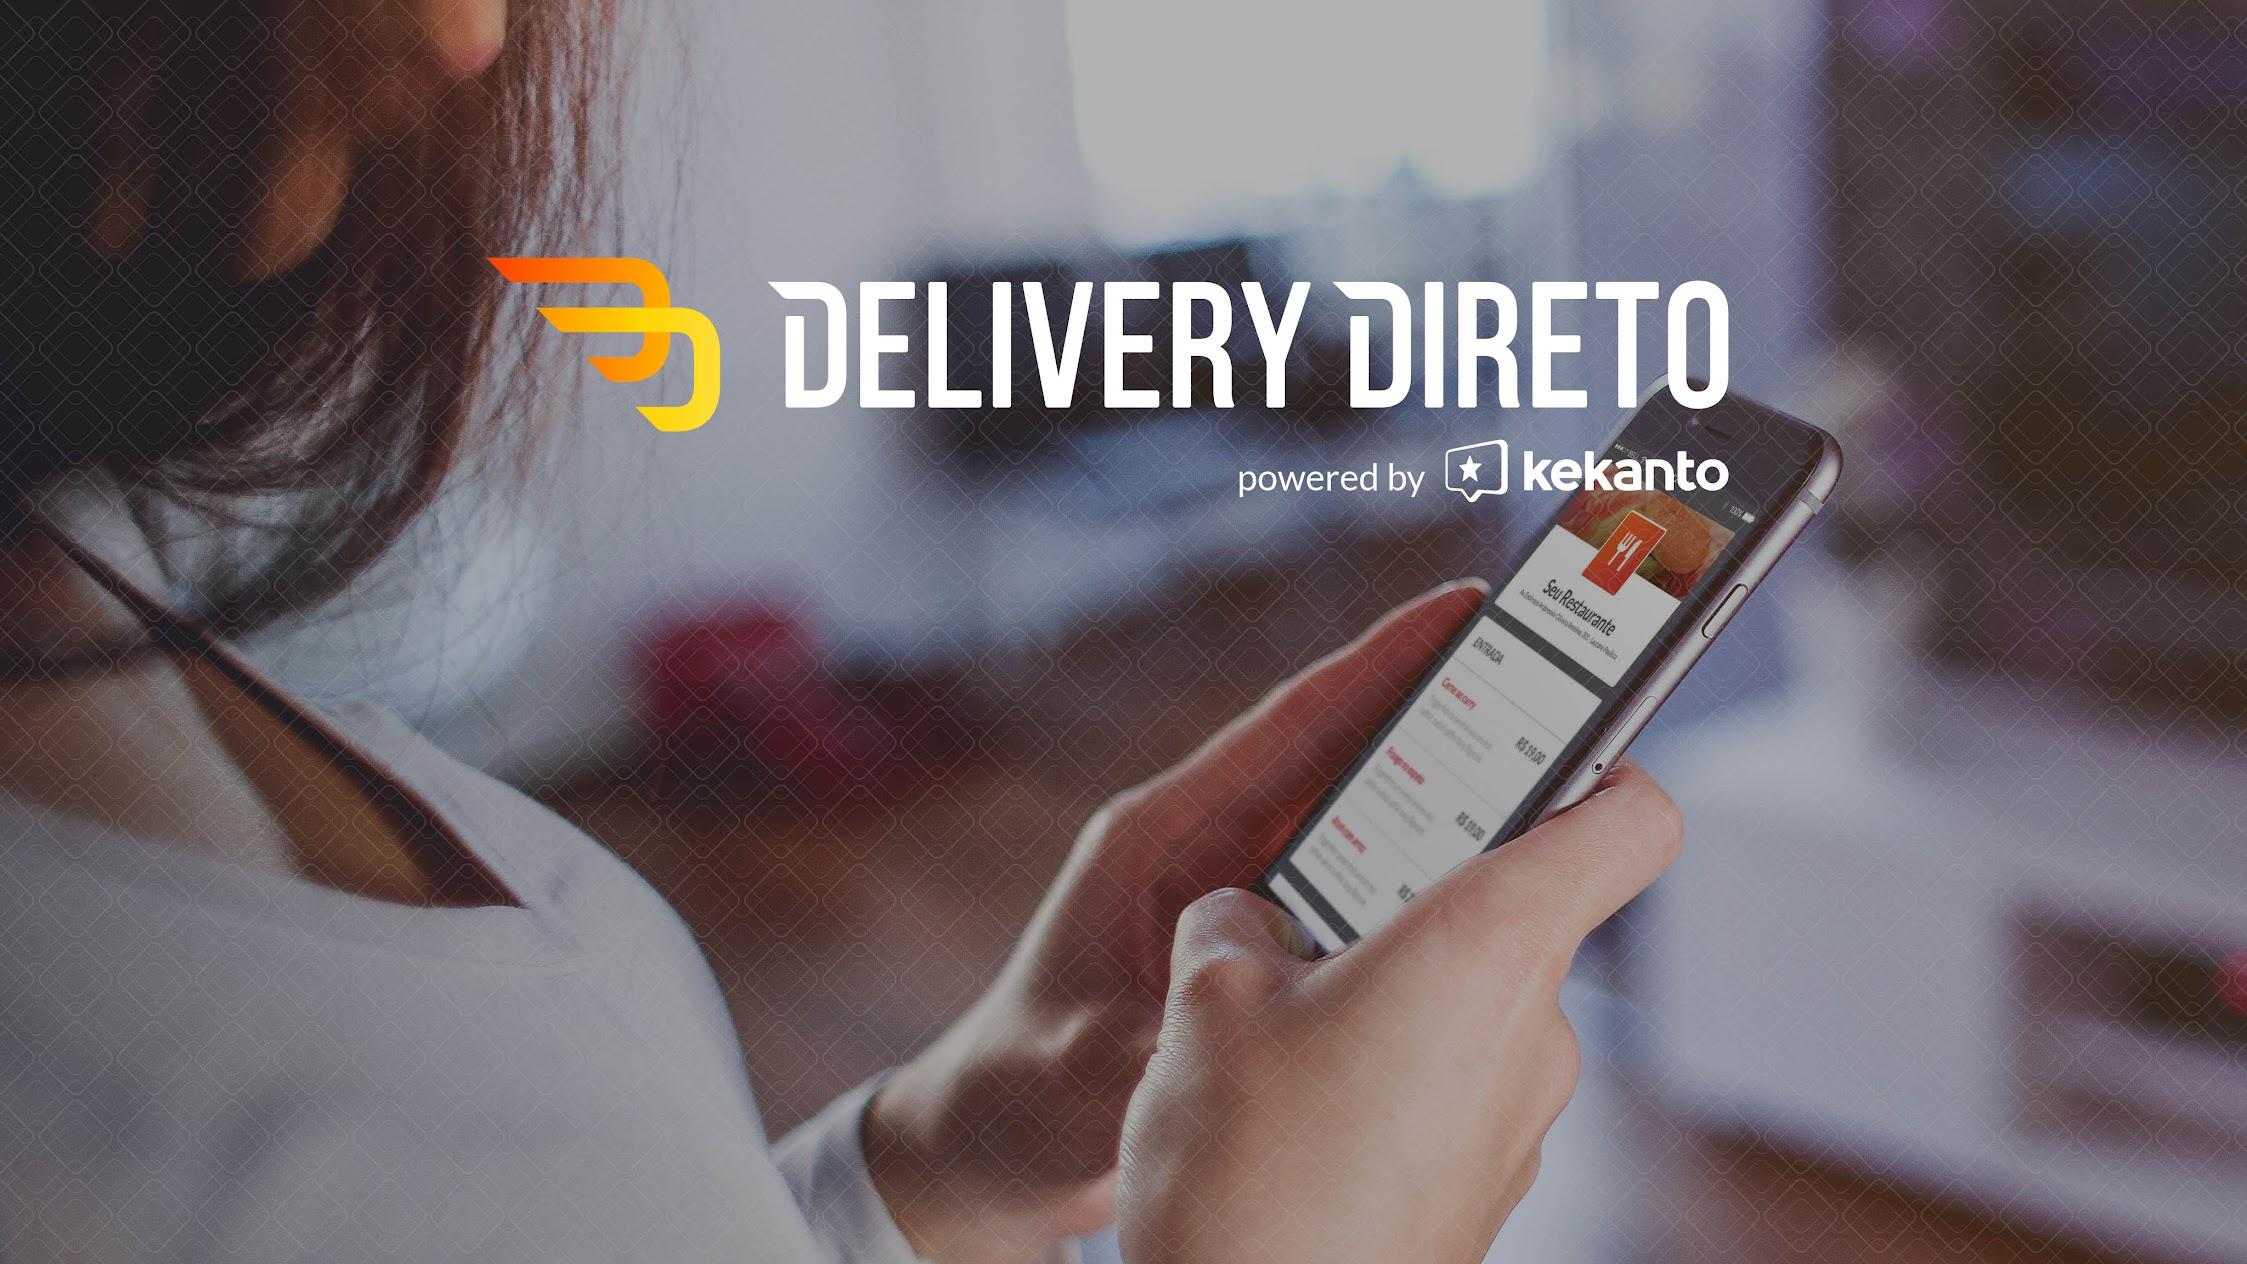 Delivery Direto by Kekanto